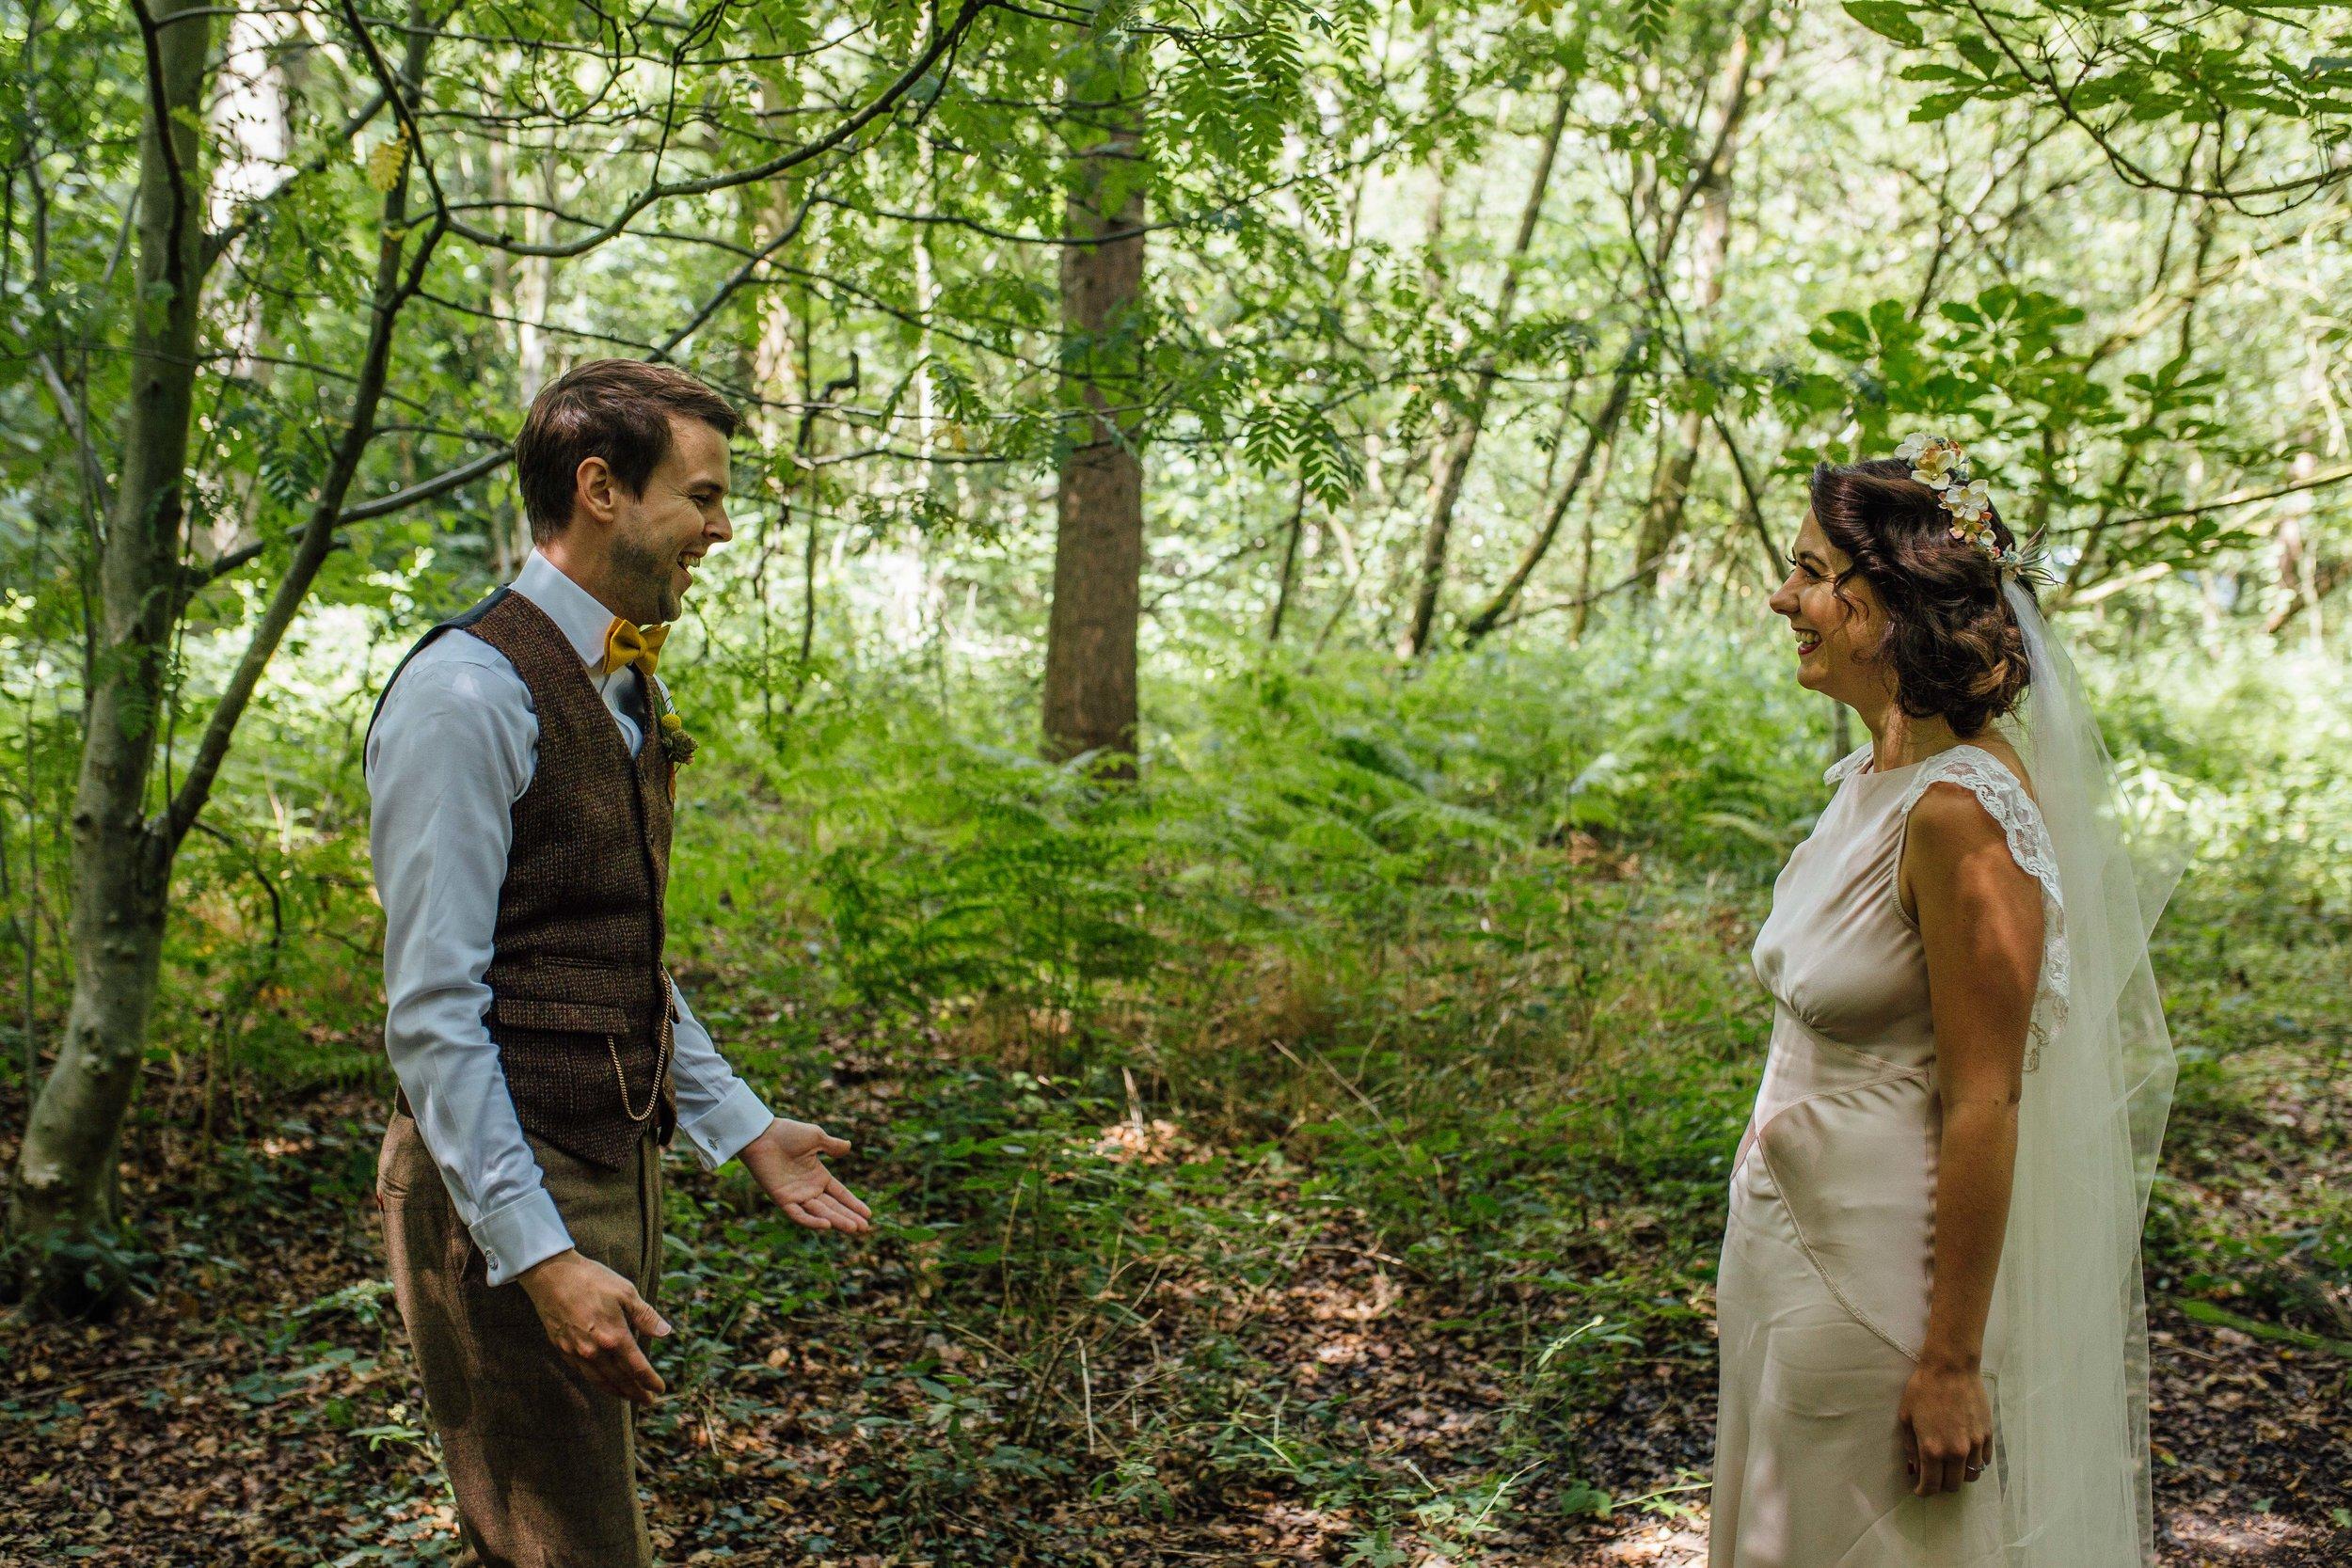 Katy-Bespoke-Veil-Sheffield-Wedding-Wes-Anderson-Susanna-Greening-Derbyshire-6